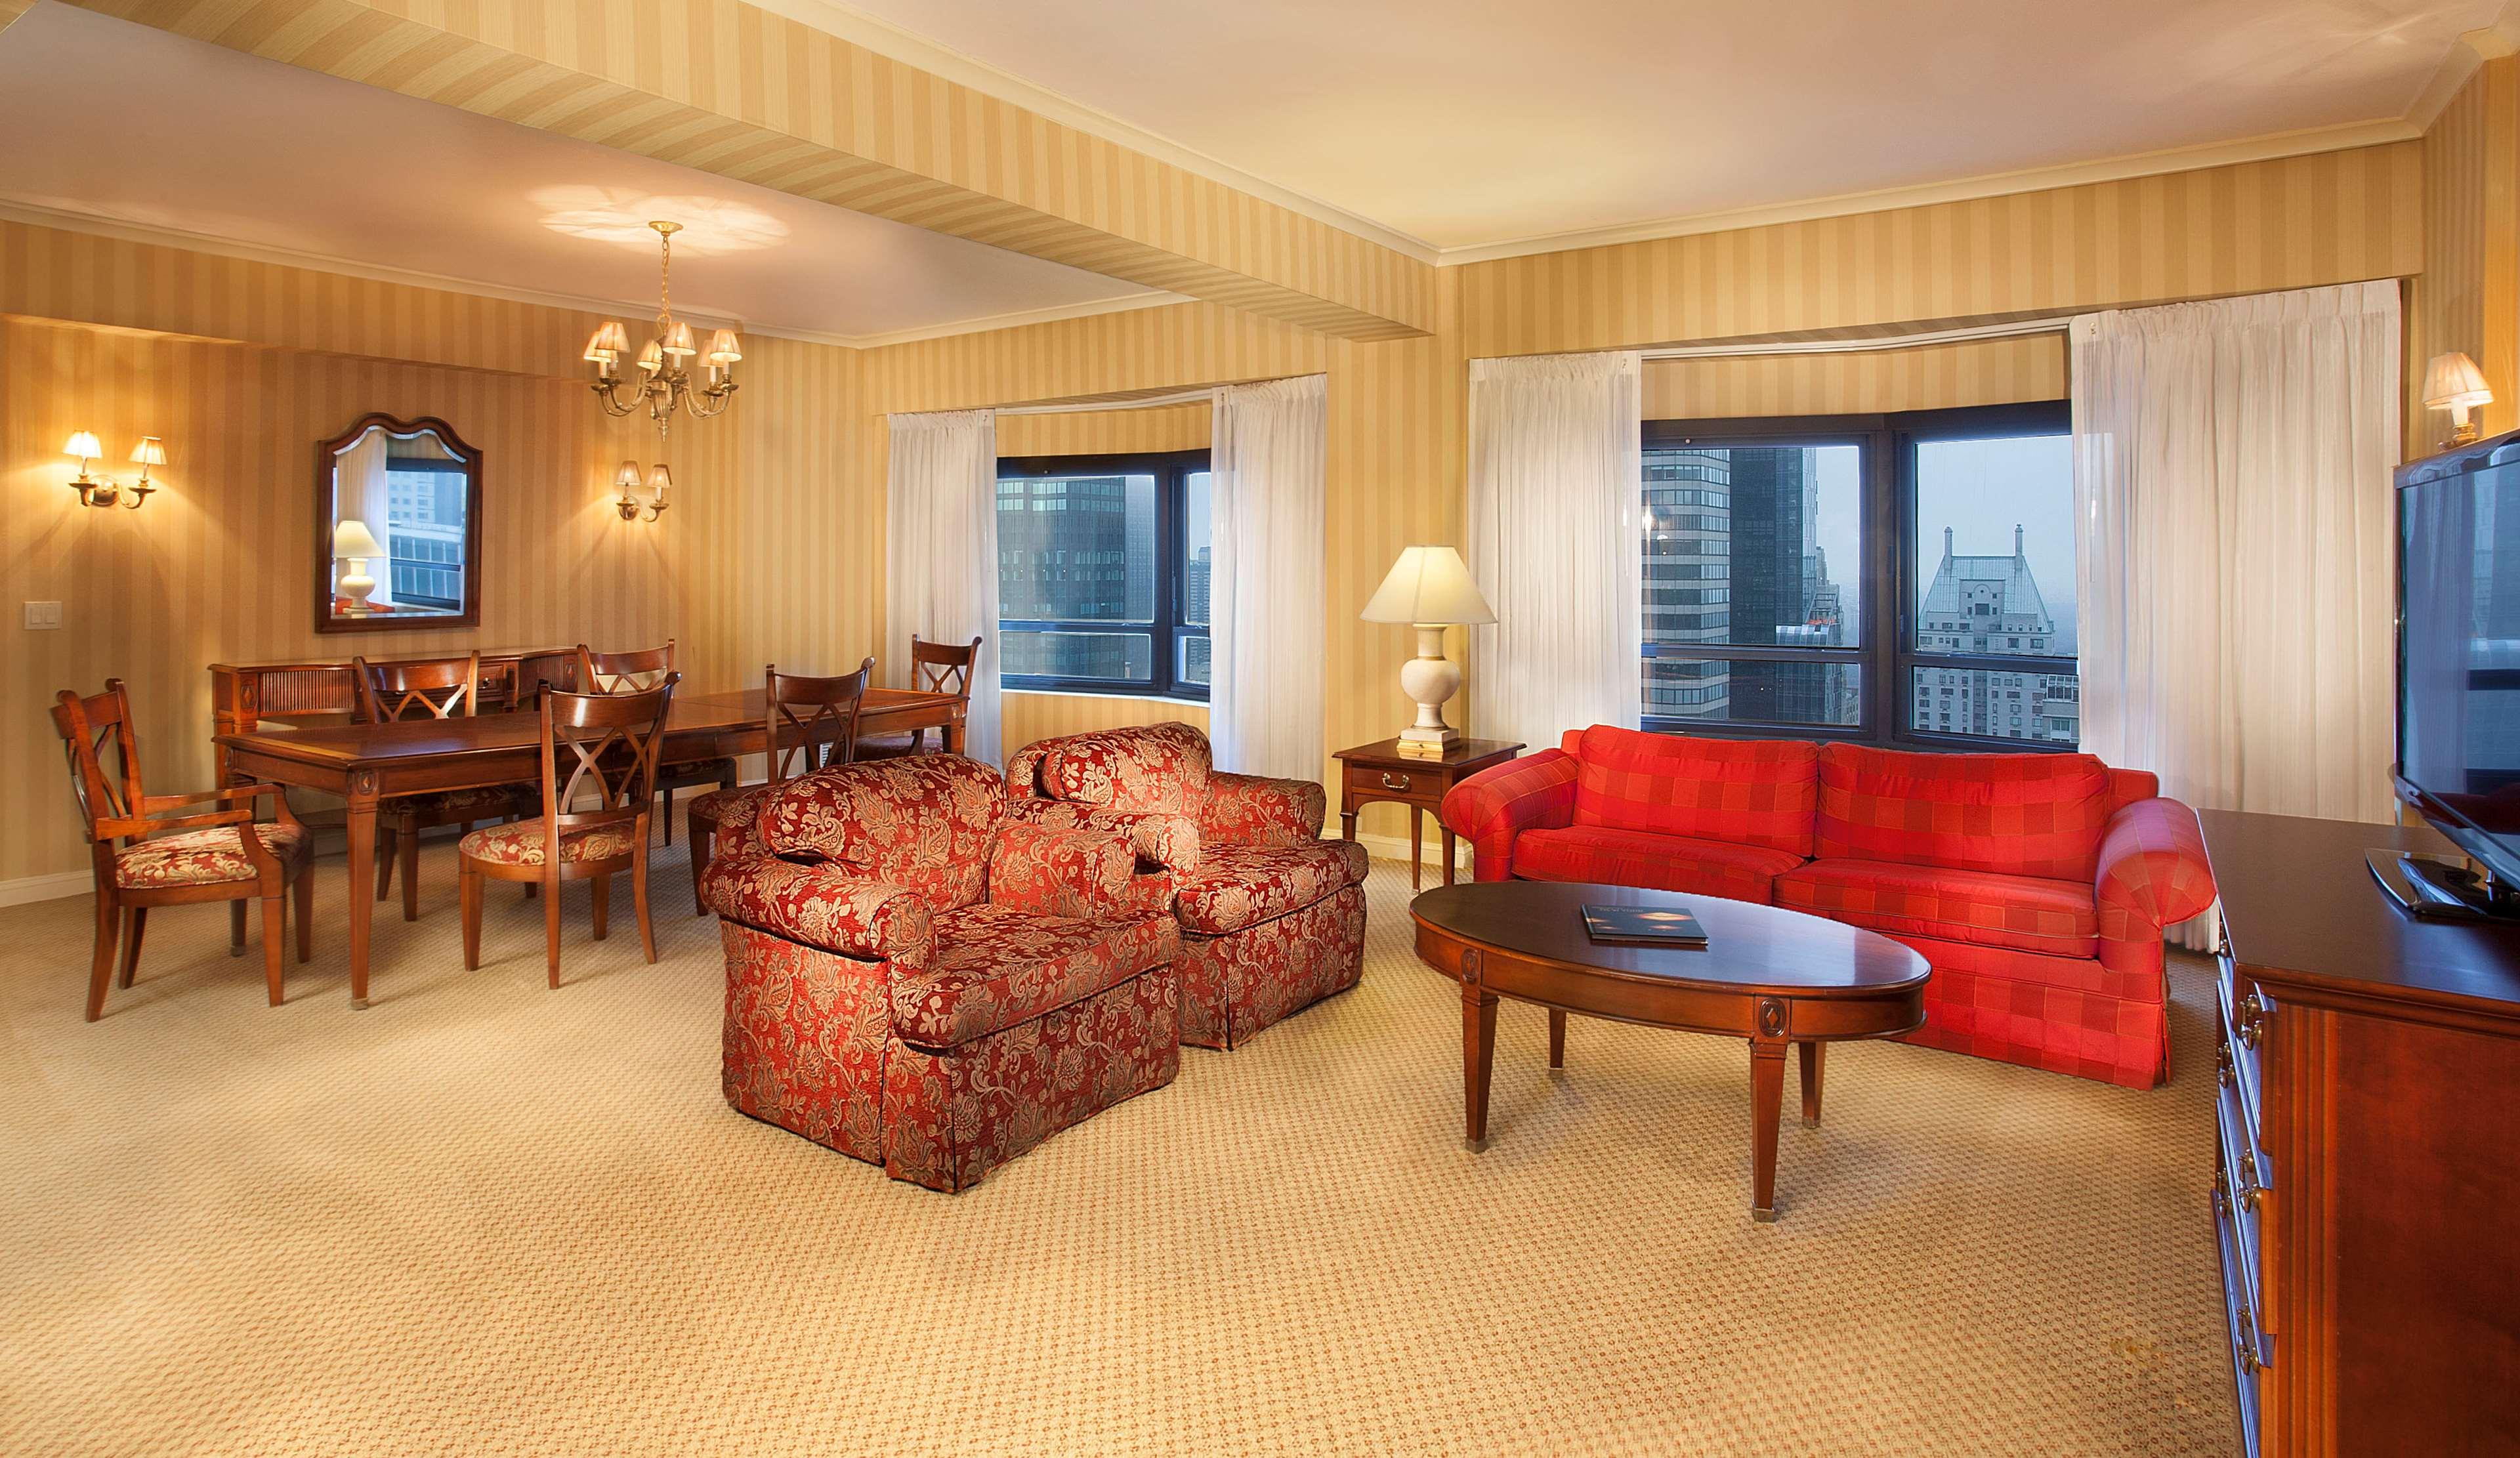 New York Hilton Midtown image 33